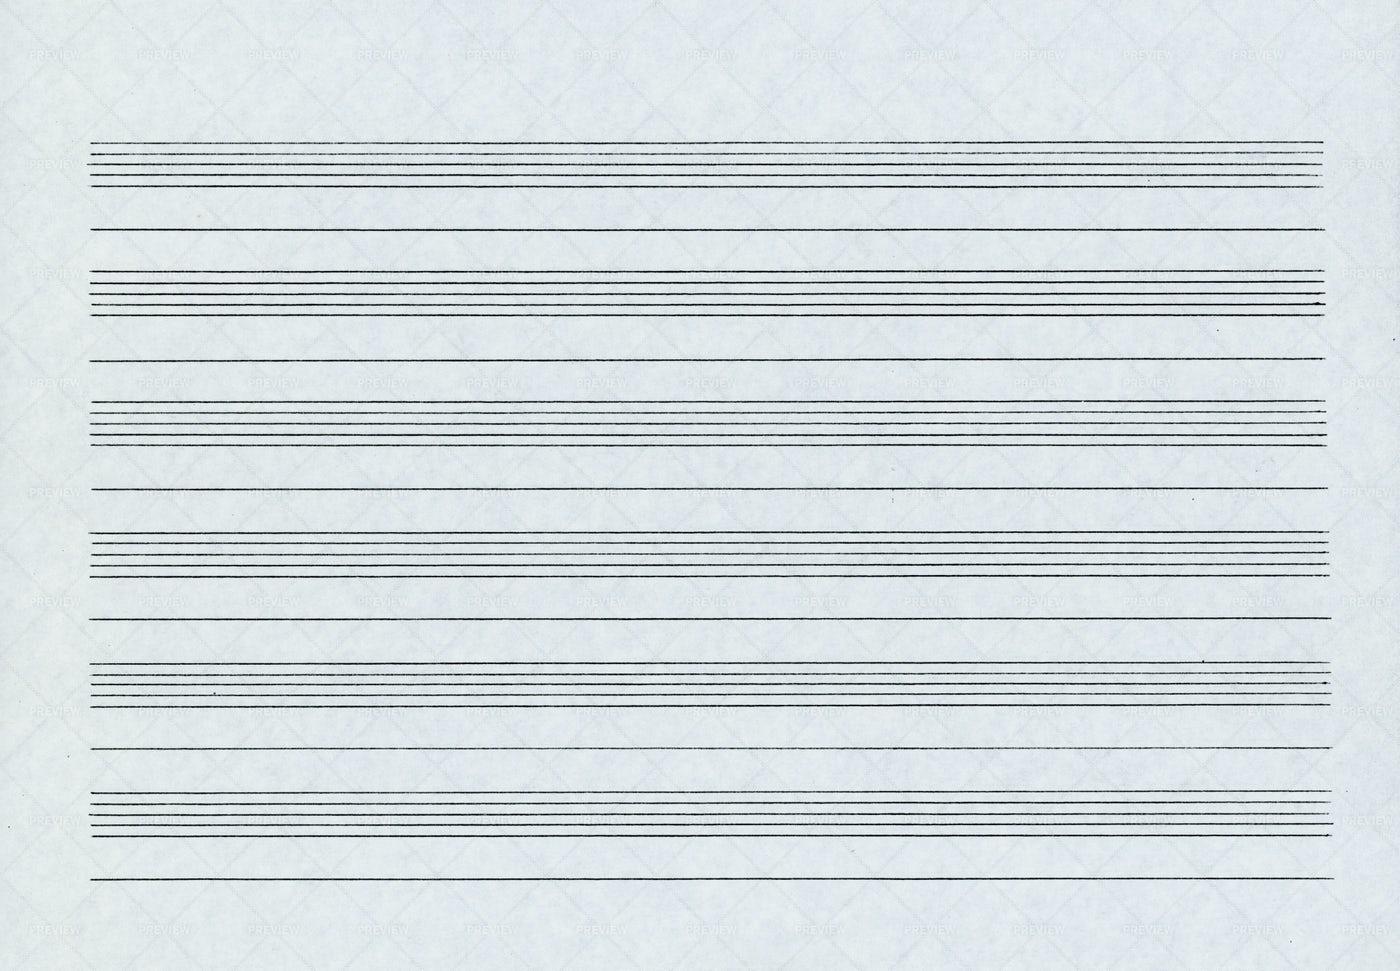 Music Staff Paper: Stock Photos